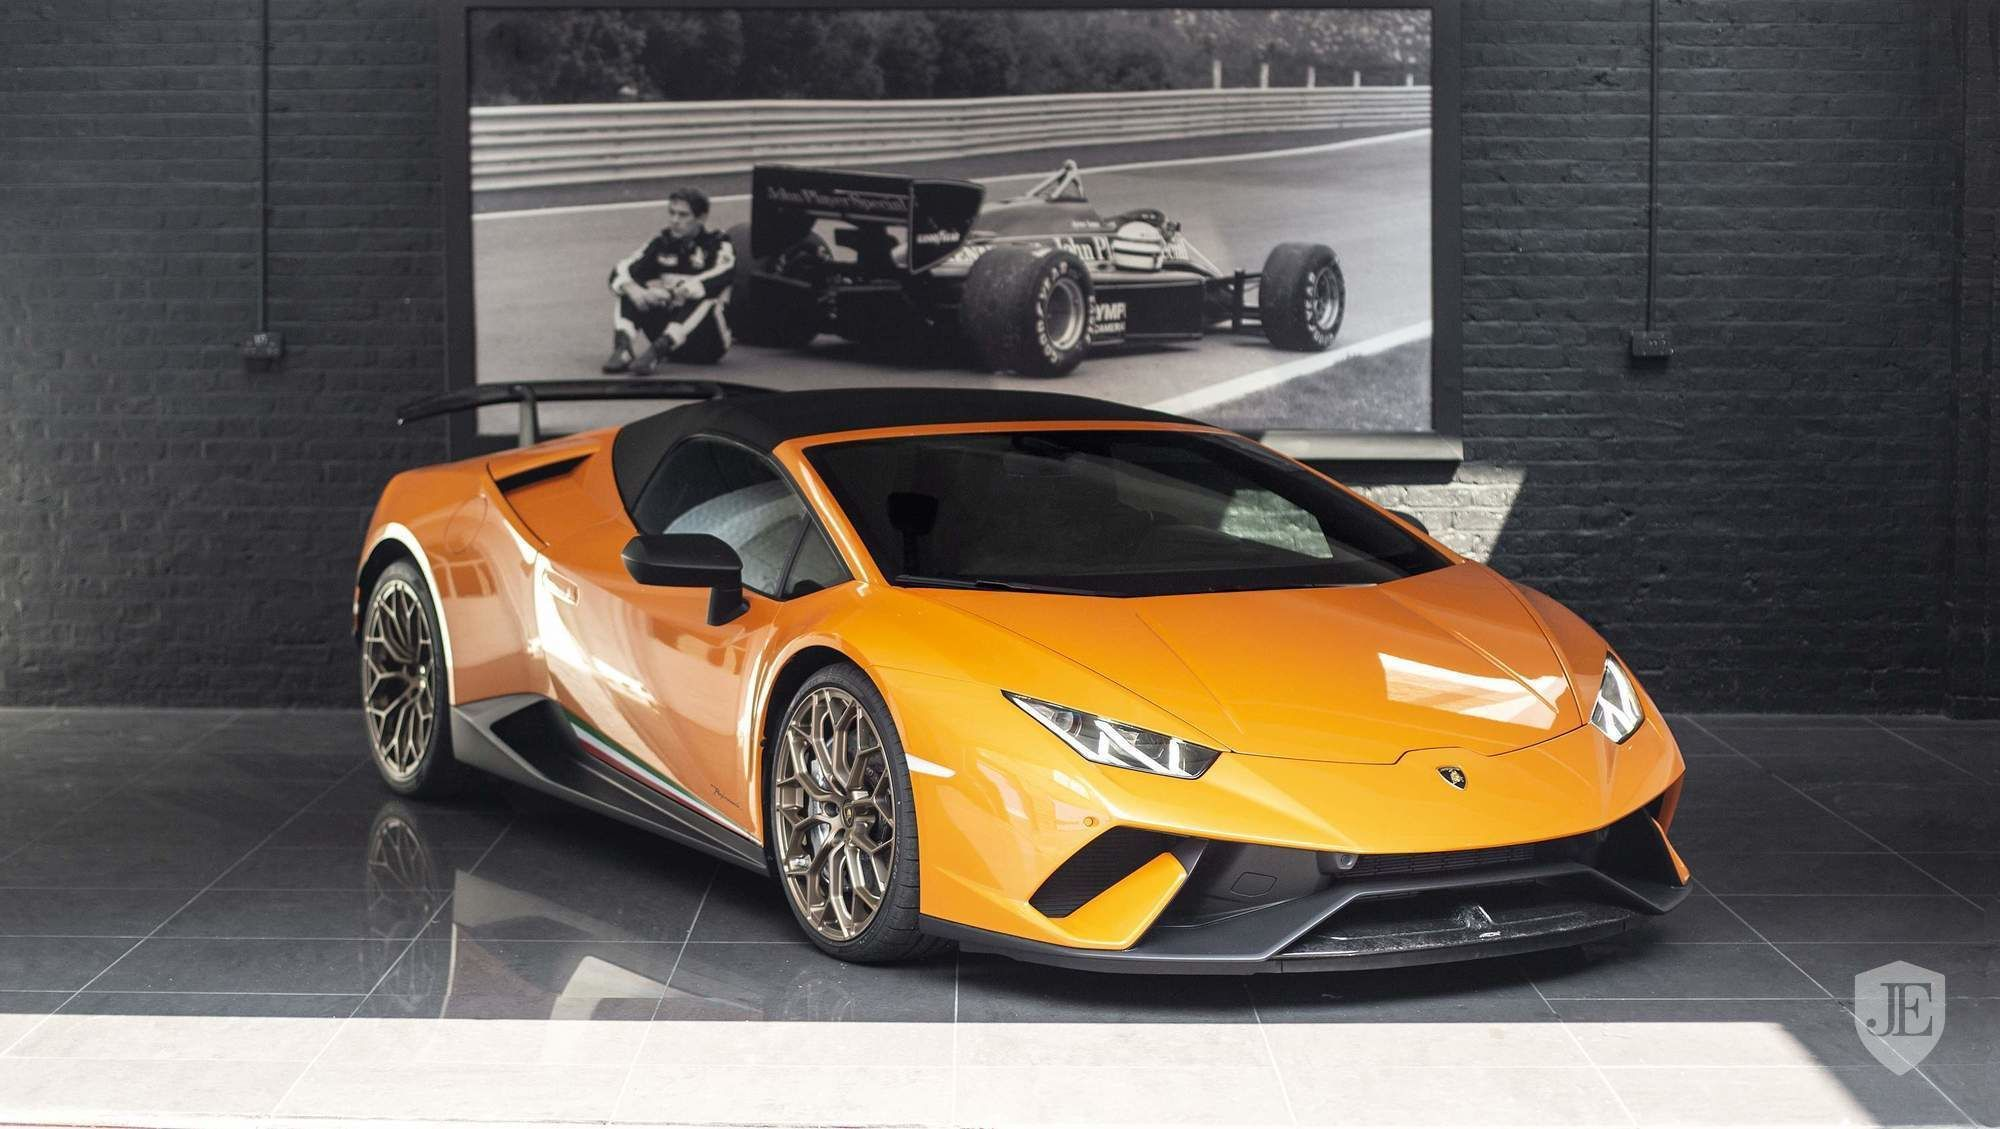 Lamborghini For Sale >> 2018 Lamborghini Huracan Performante In London United